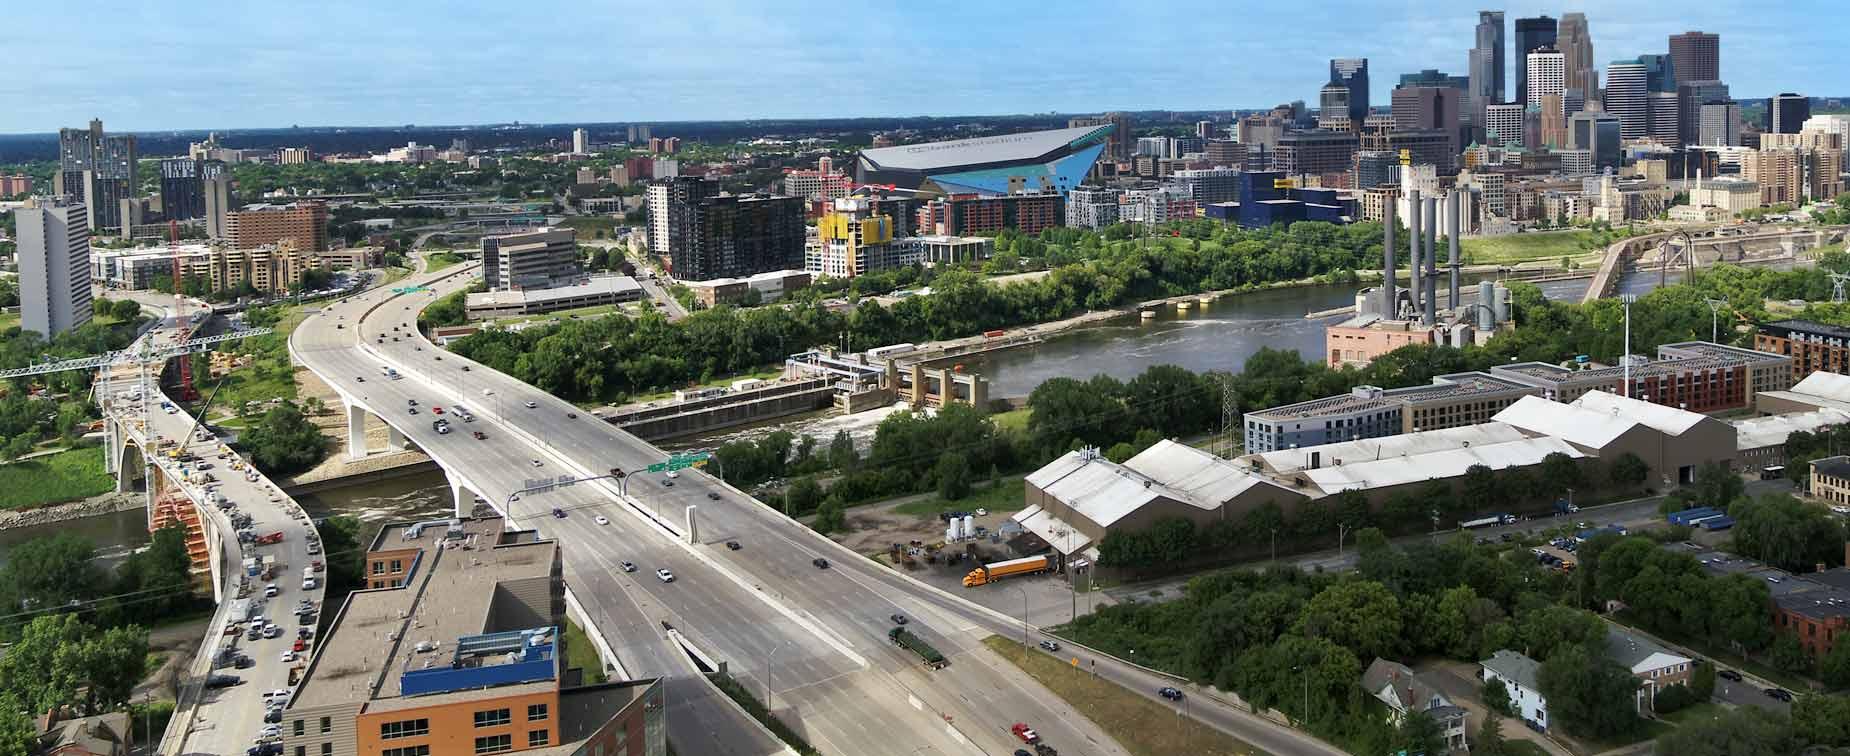 Aerial view of I-35W bridge